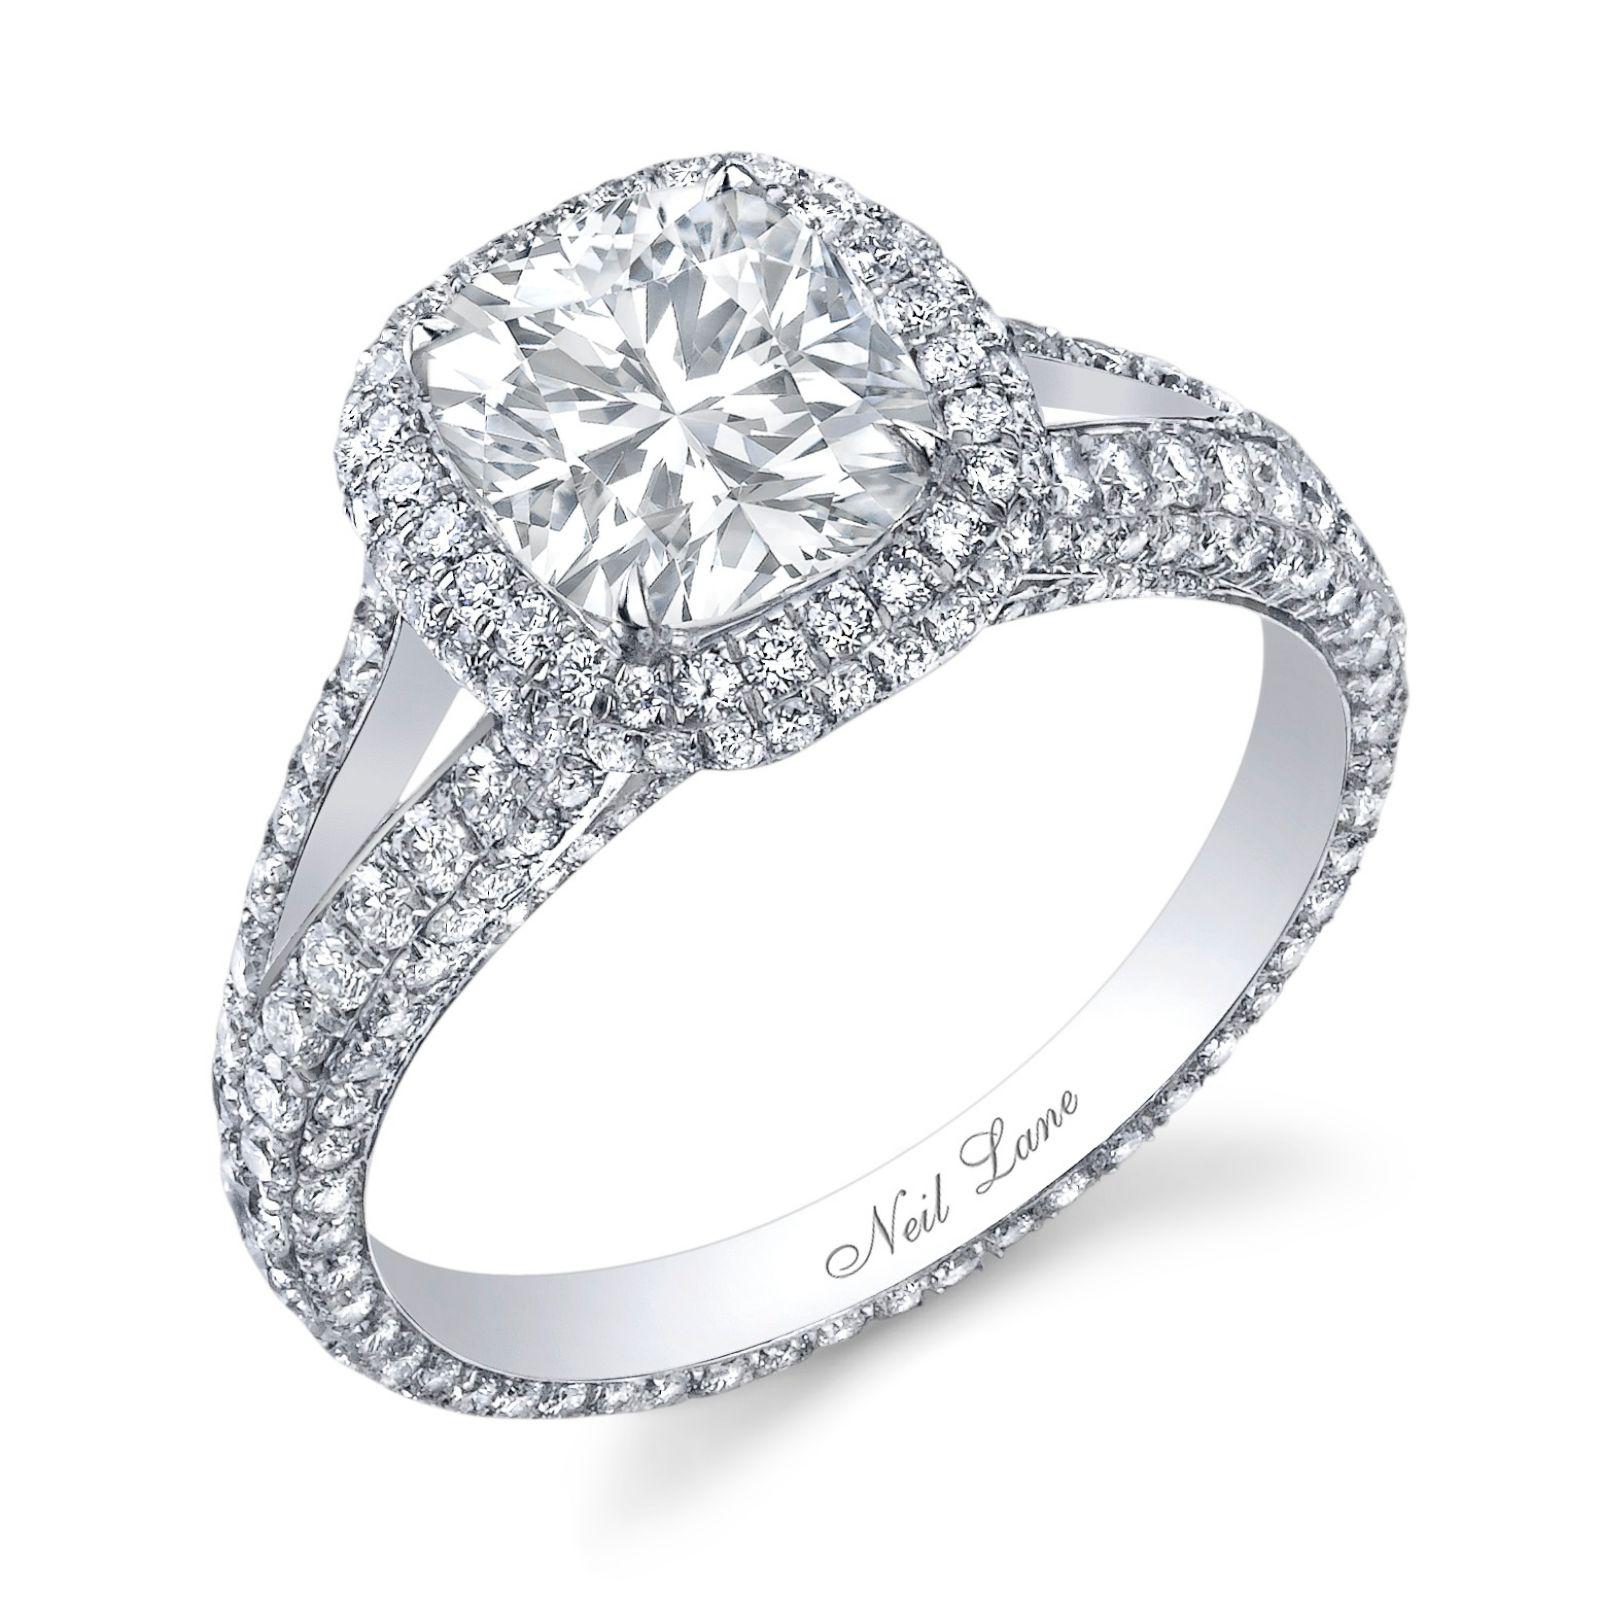 bachelor engagement ring favorite wedding ring A history of Bachelor and Bachelorette engagement rings Photos ABC News